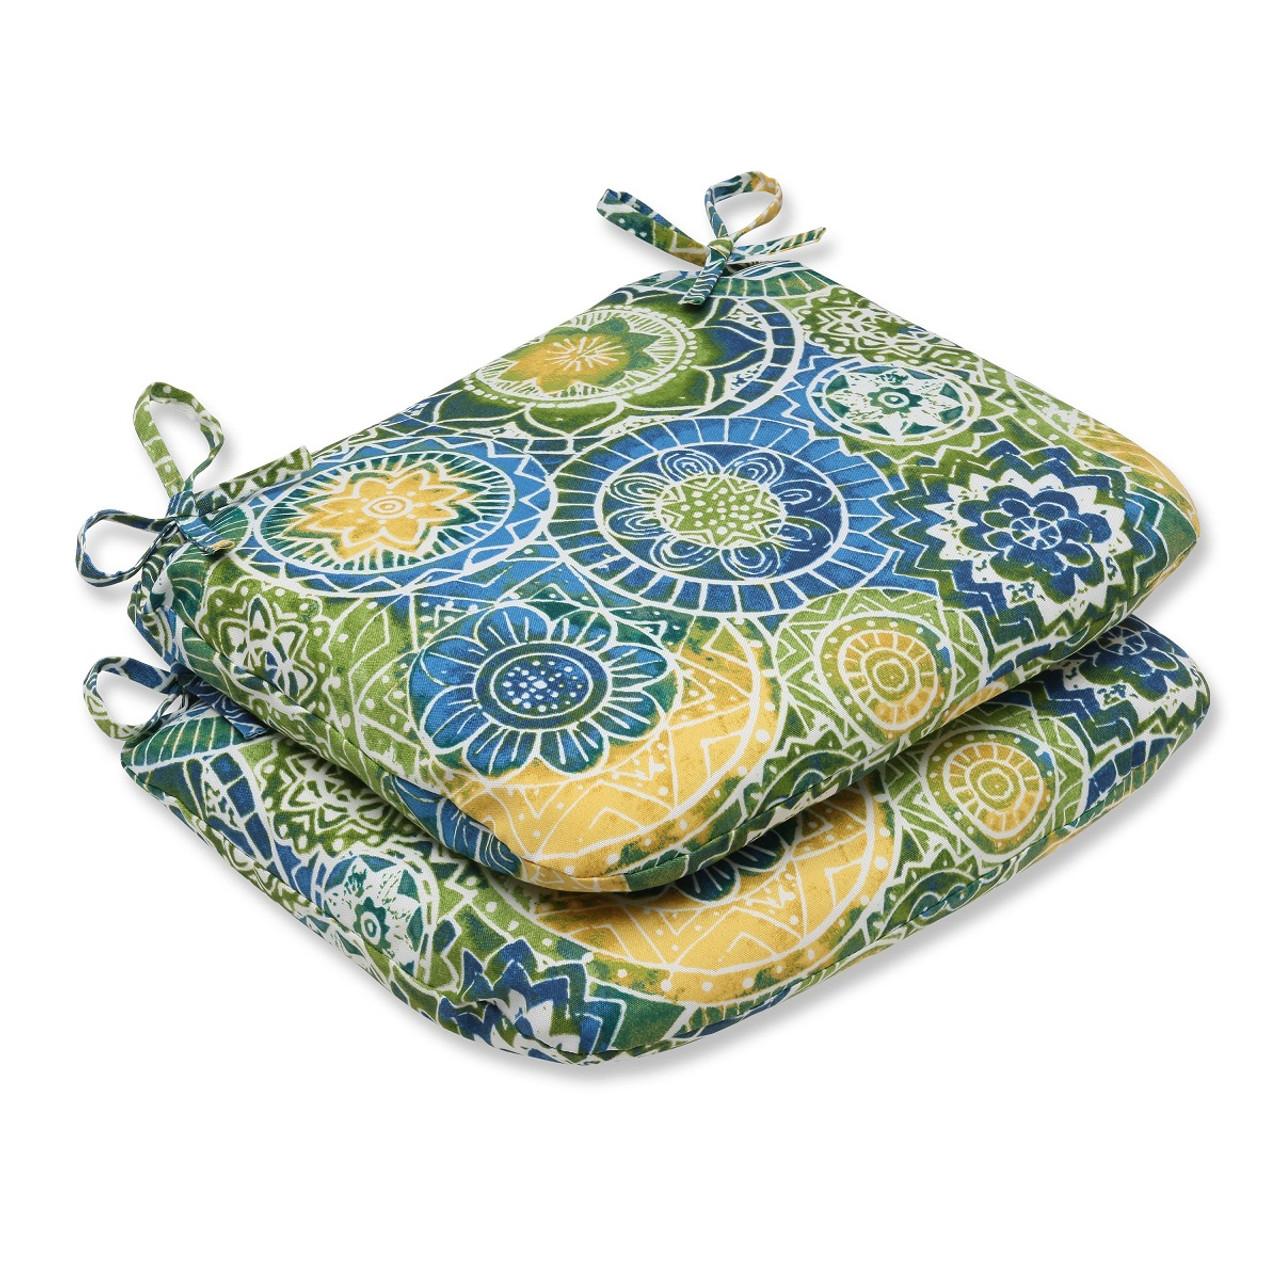 18 Round Patio Chair Cushions: Set Of 2 Laguna Mosaico Blue, Green & Yellow Outdoor Patio